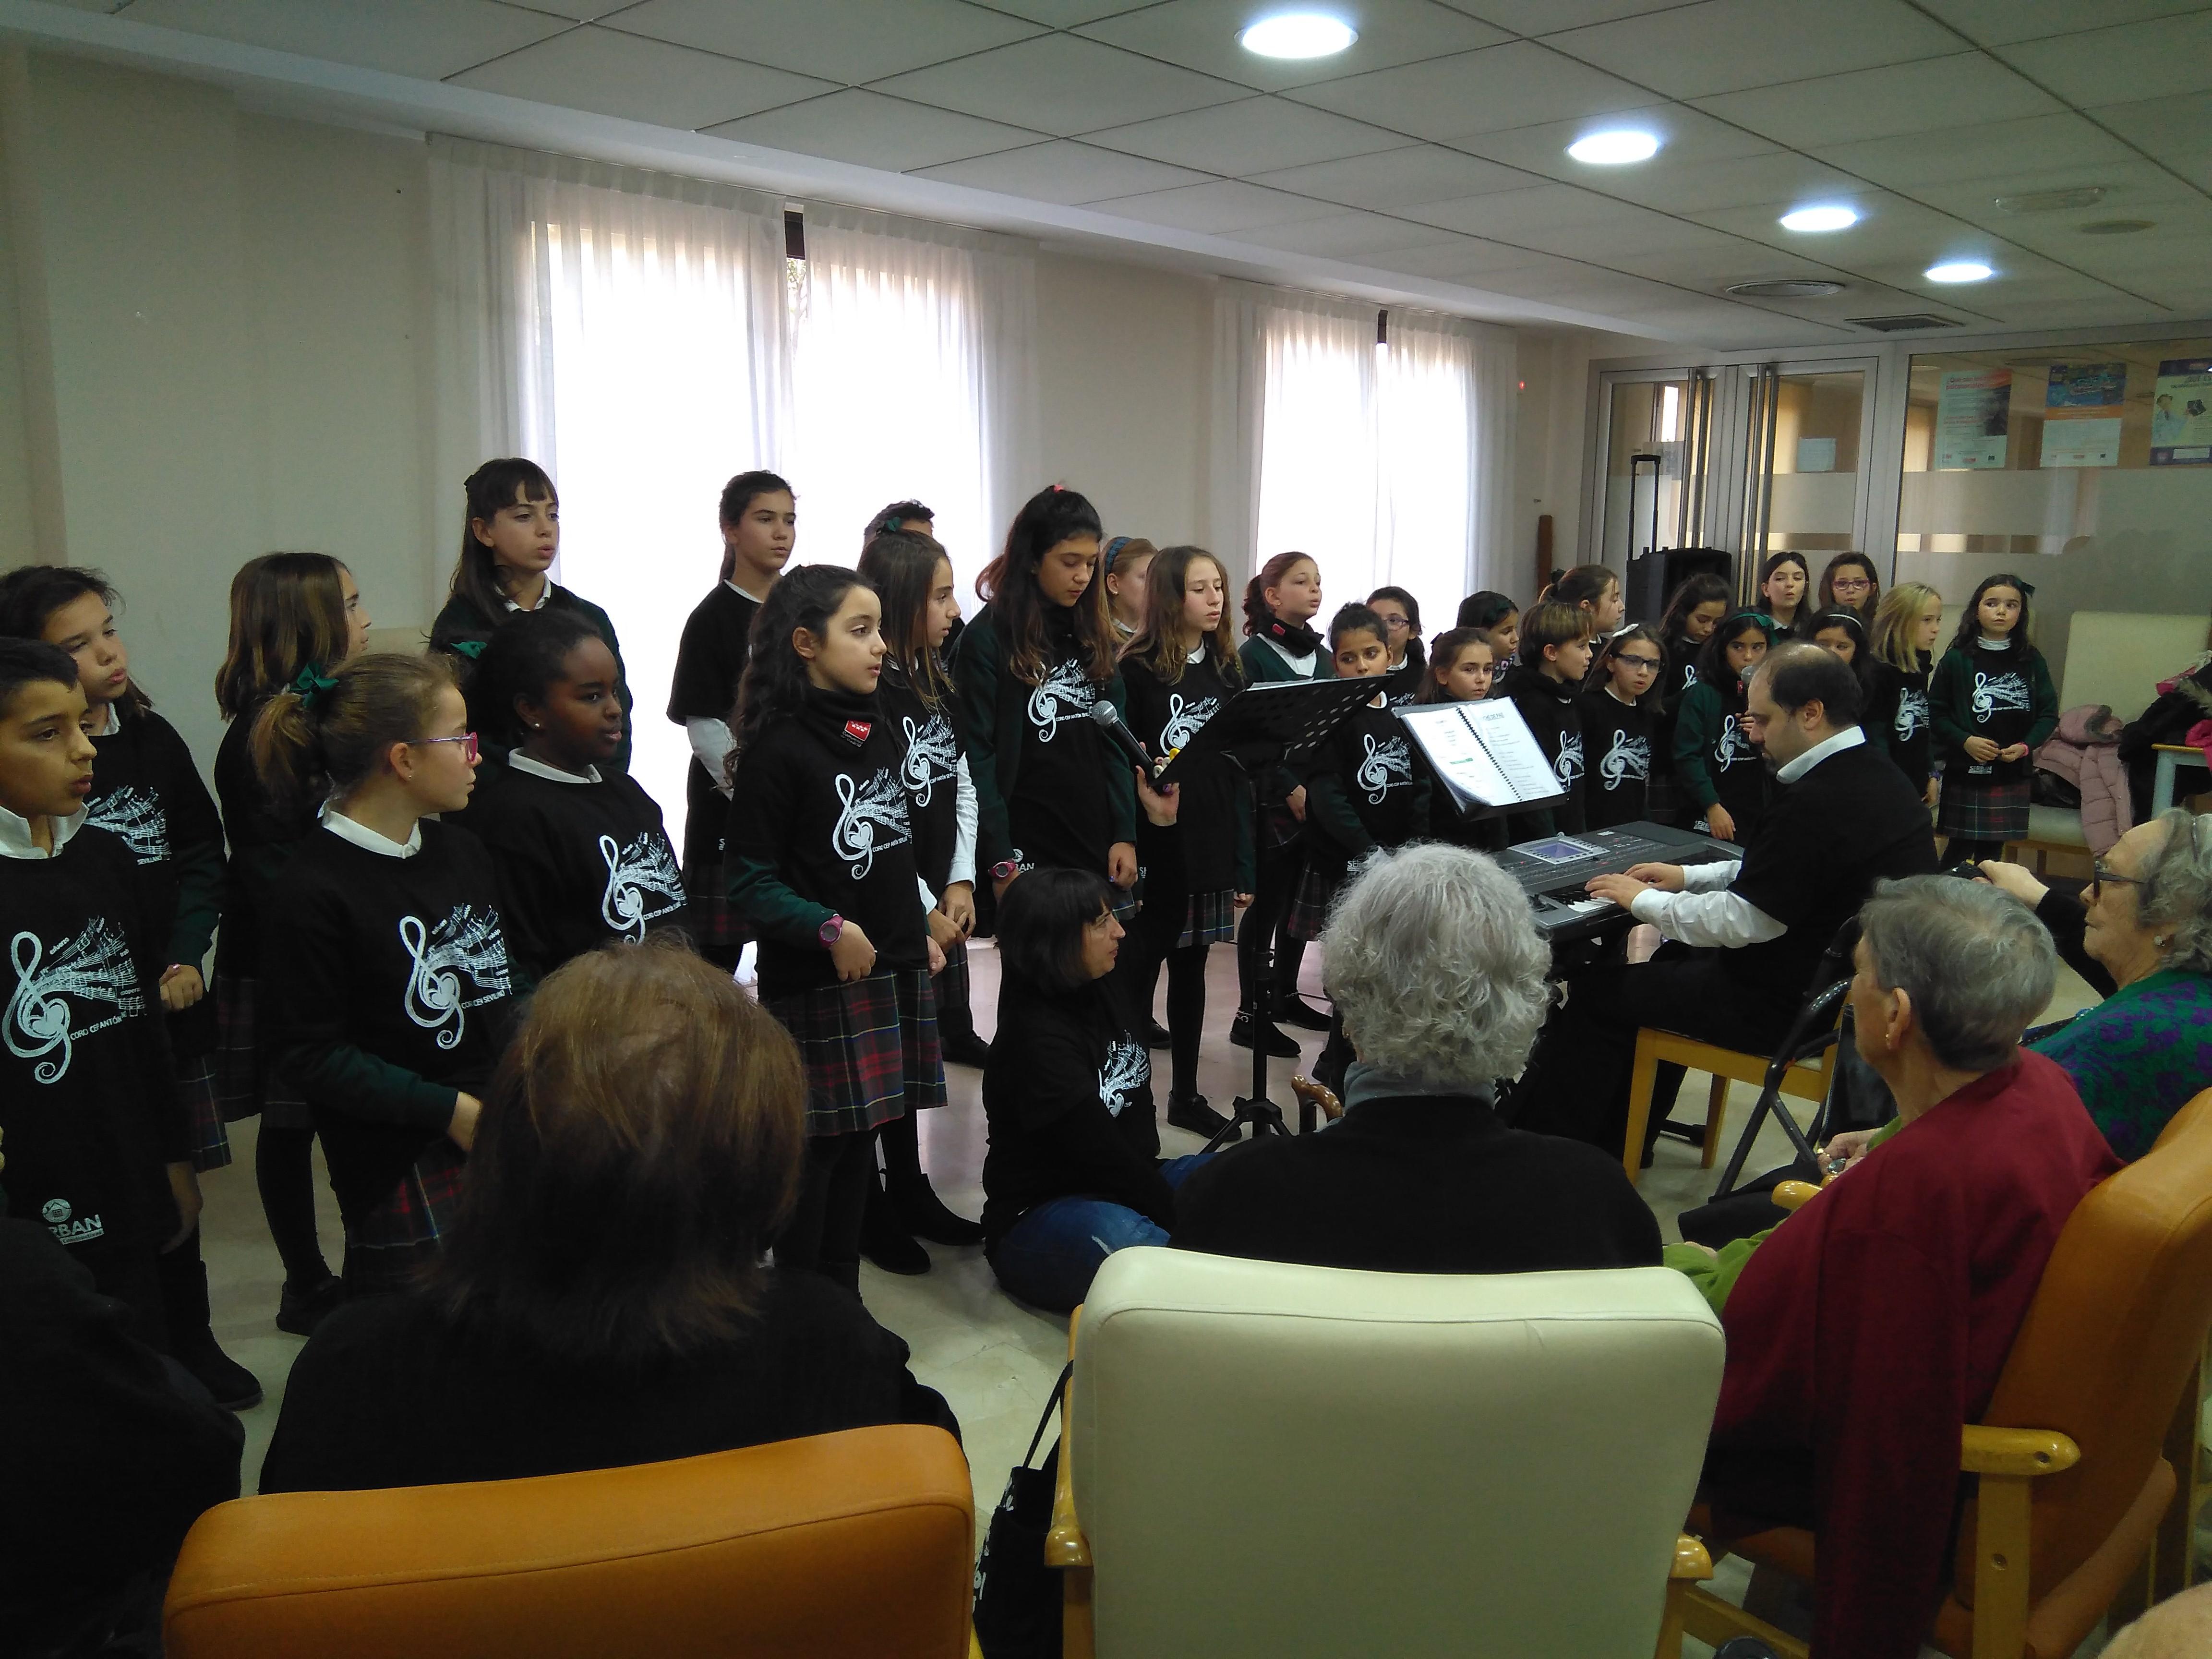 http://www.rosalbagestion.es/coro-colegio-anton-sevillano-rsln/